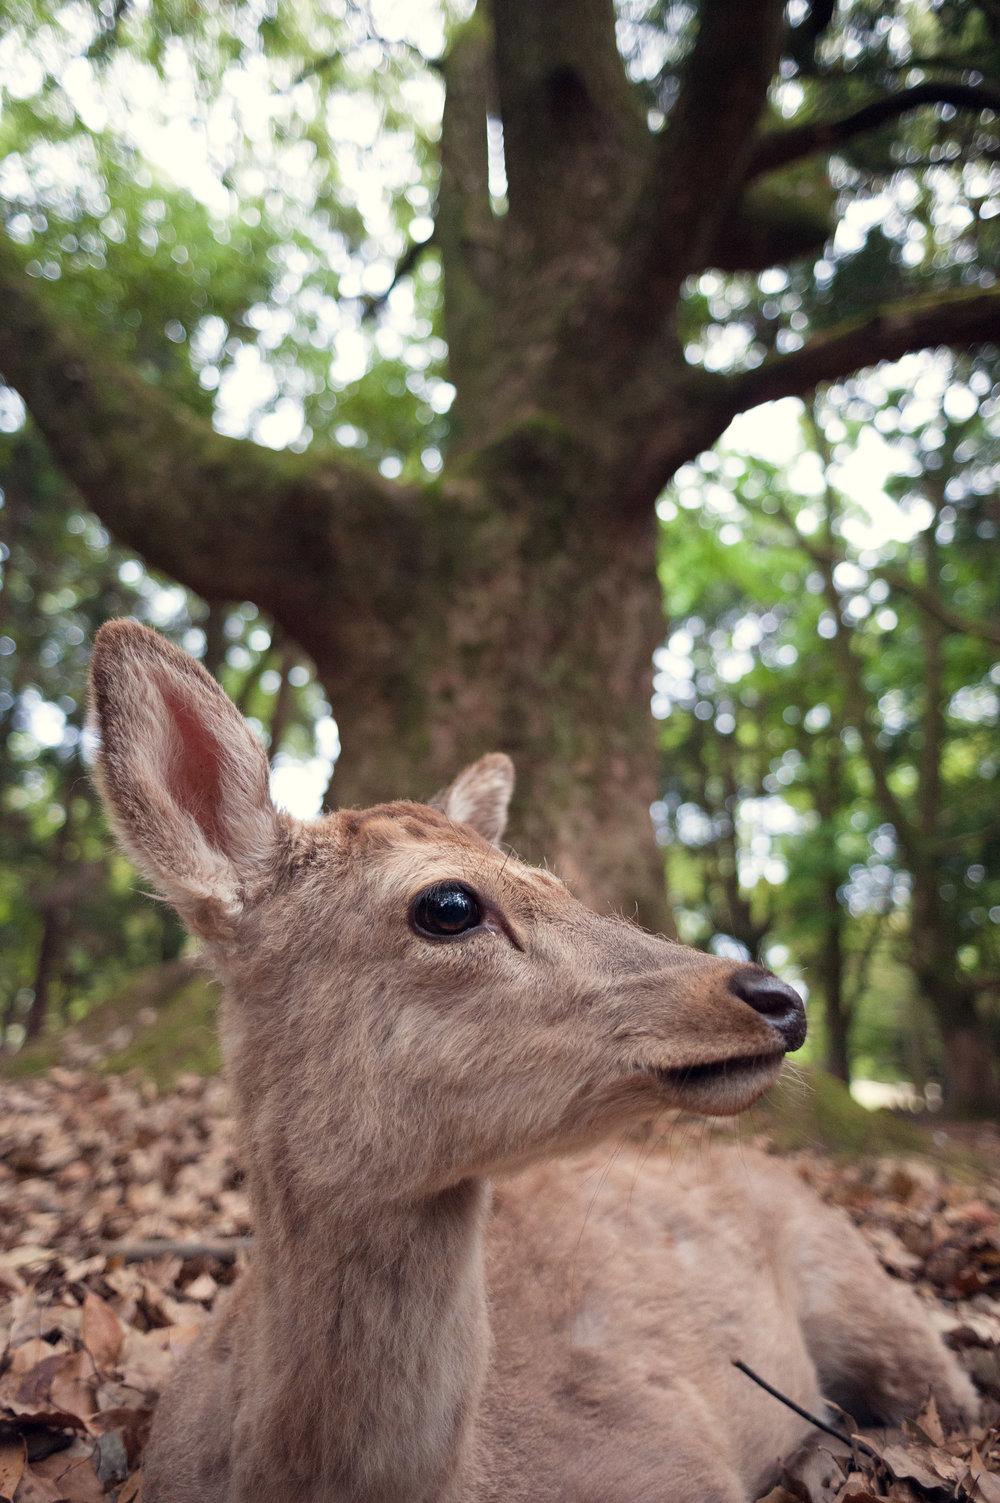 nara-deer-photography-japan-kyoto-osaka-pierre-melion (1 of 1).jpg